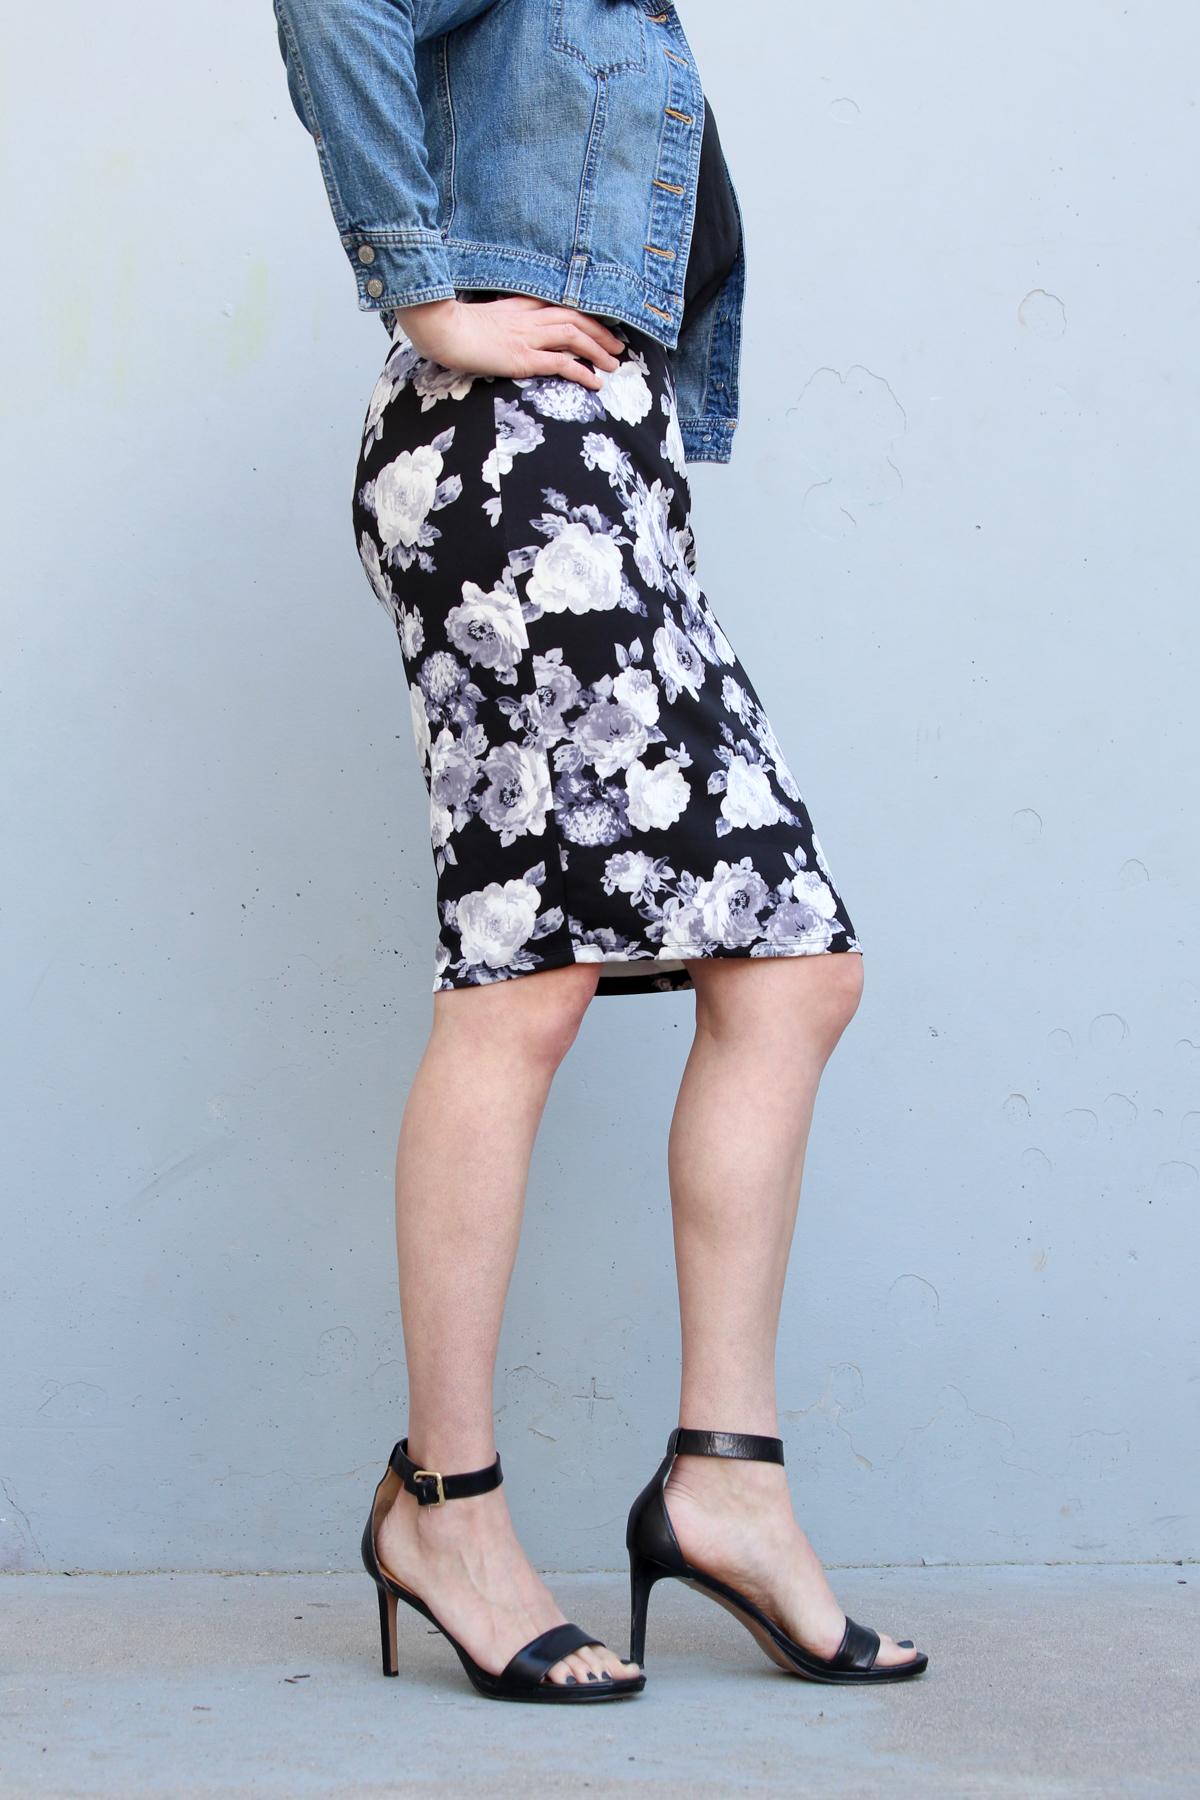 How to Wear a Floral Skirt via @PagingSupermom